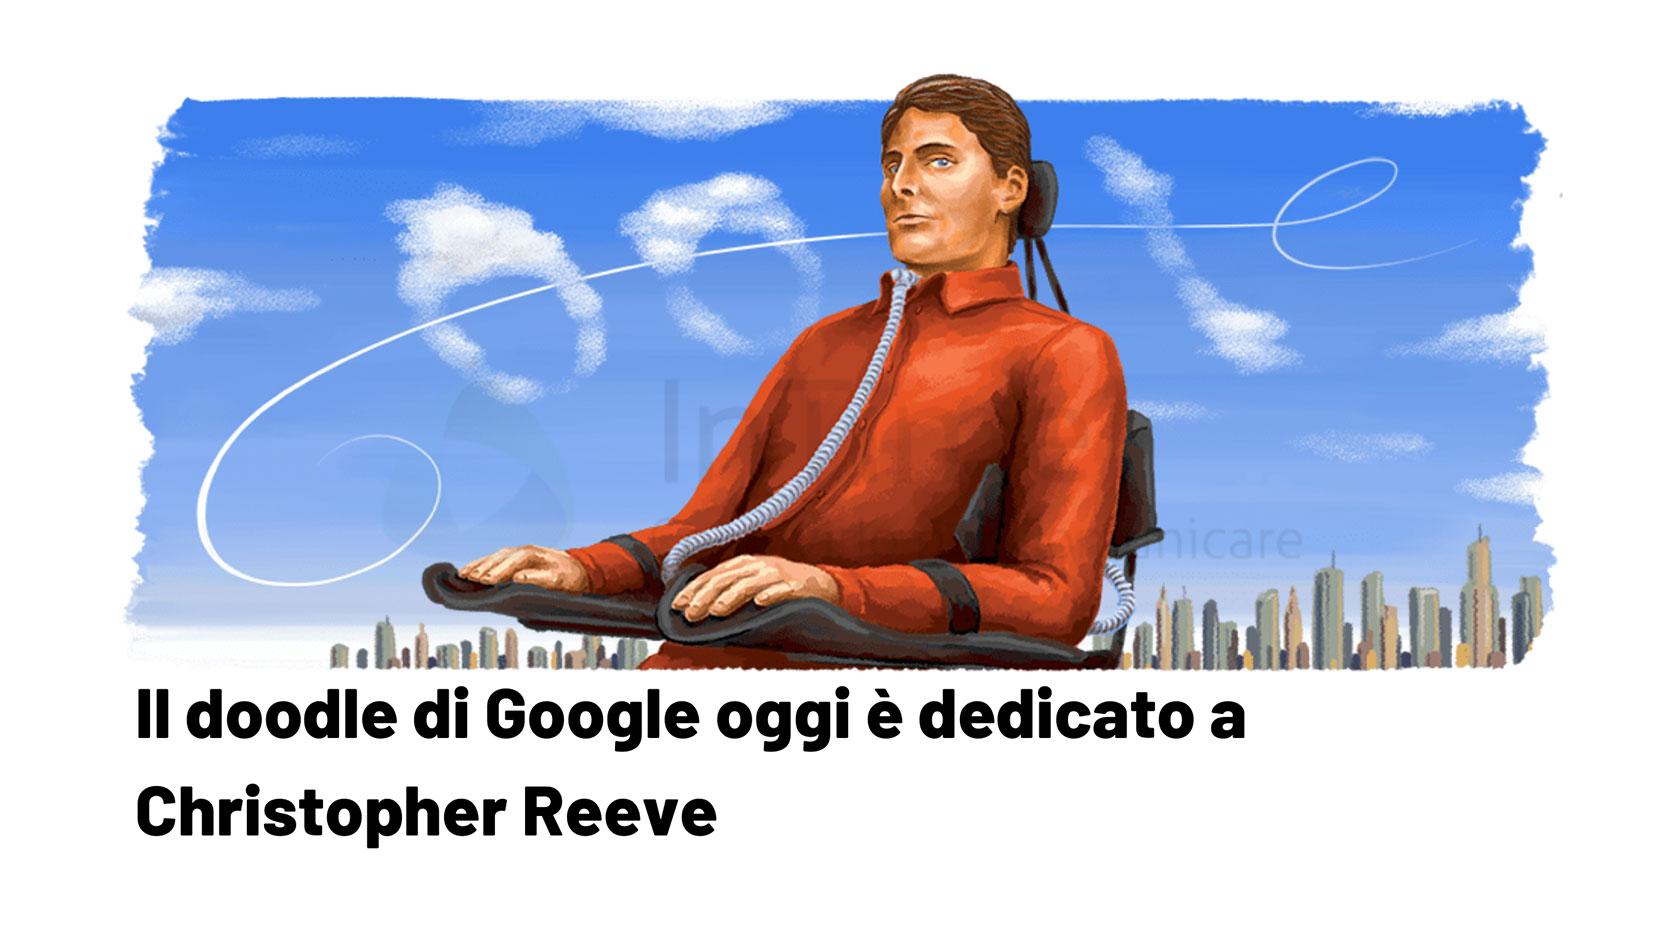 doodle Google Christopher Reeve franzrusso.it